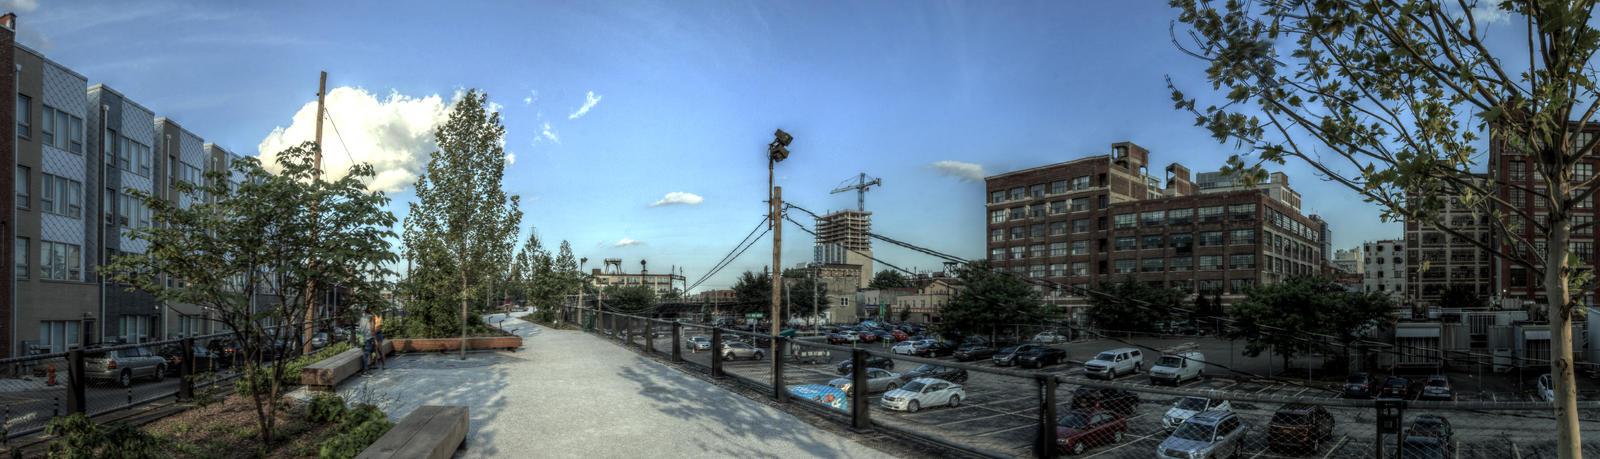 Panorama 3673 hdr pregamma 1 mantiuk06 contrast ma by bruhinb